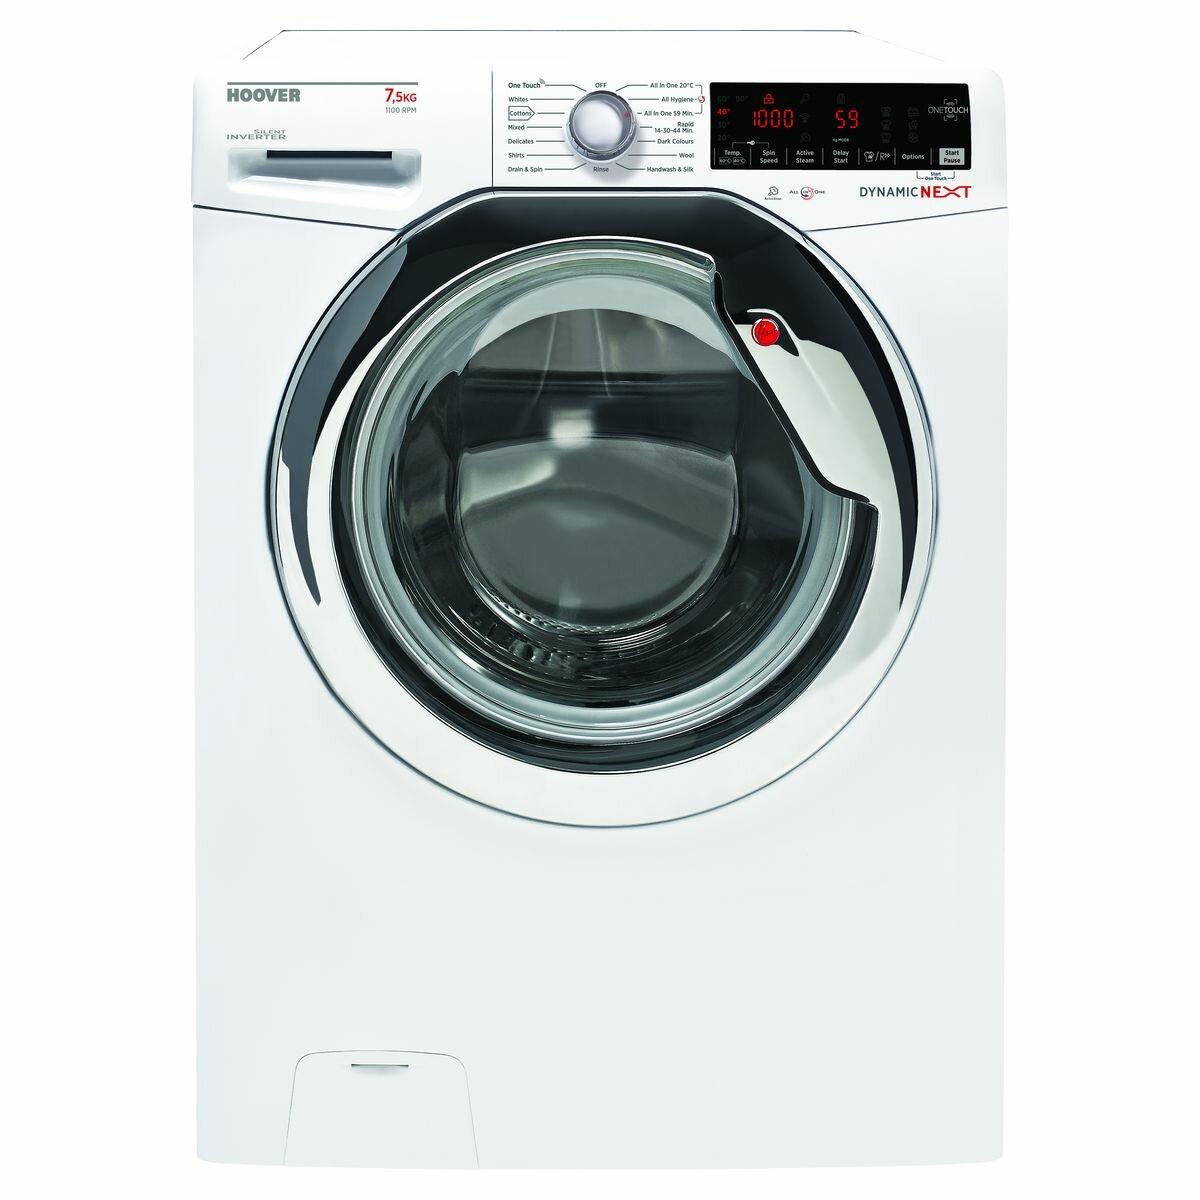 Hoover 75kg Front Load Washing Machine DXOA175AH1 AUS Hero high.jpeg